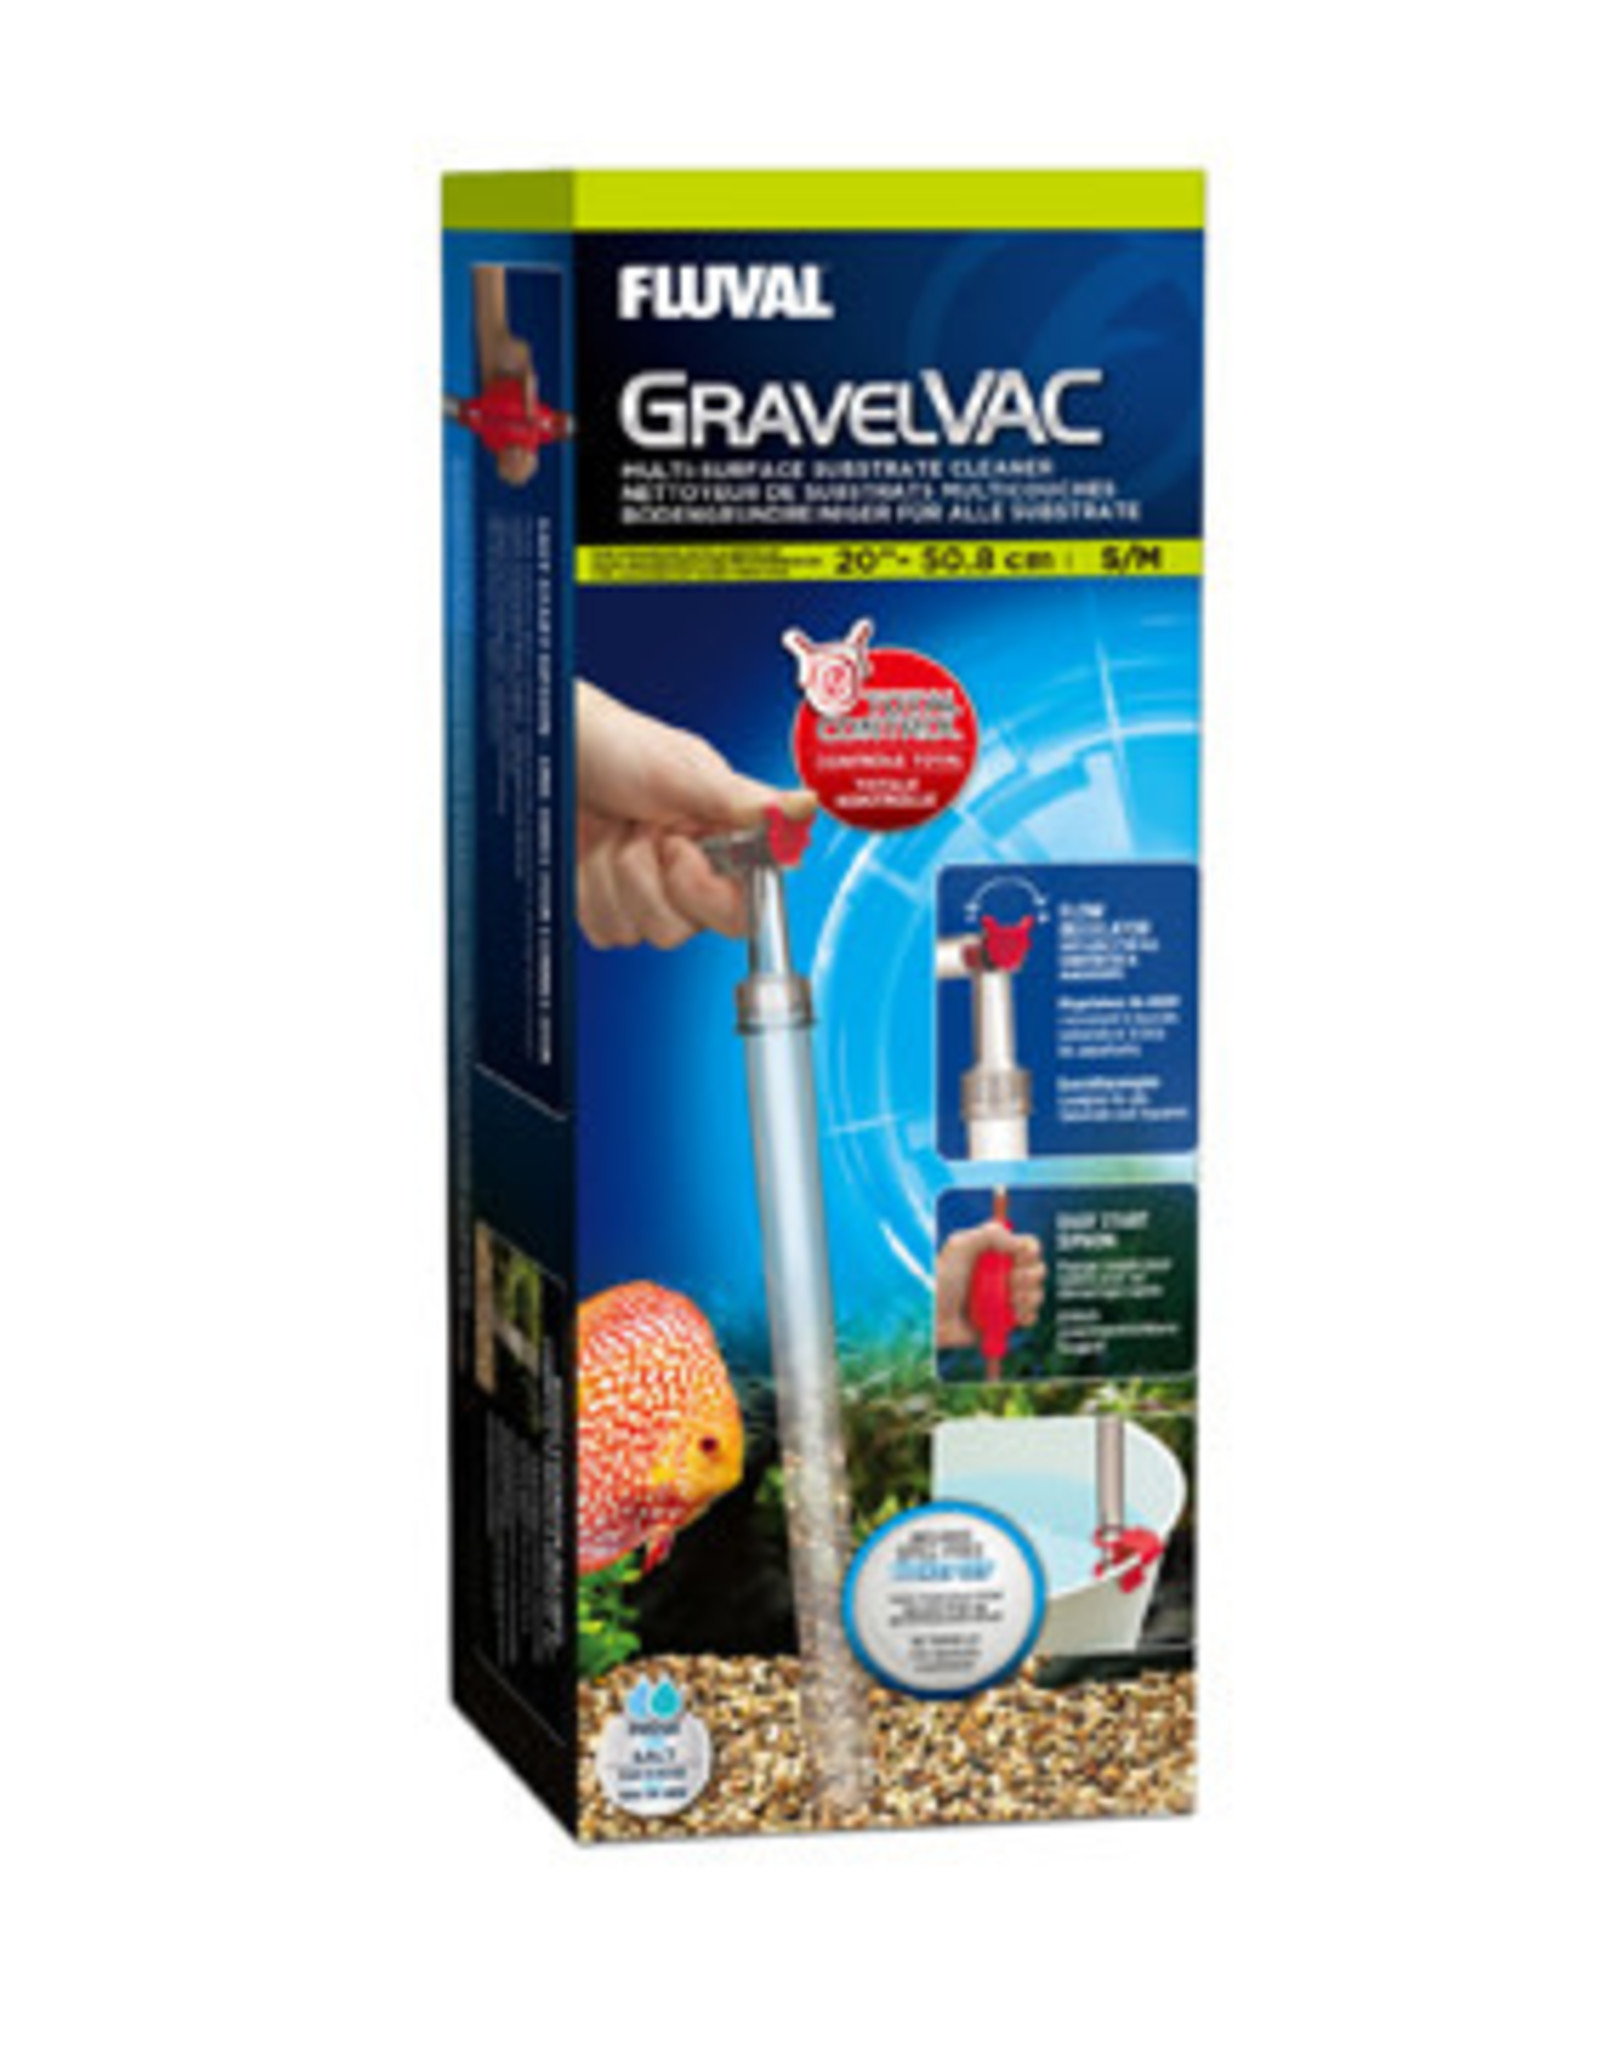 Fluval Fluval Gravel Vac Substrate Cleaner - Small/Medium